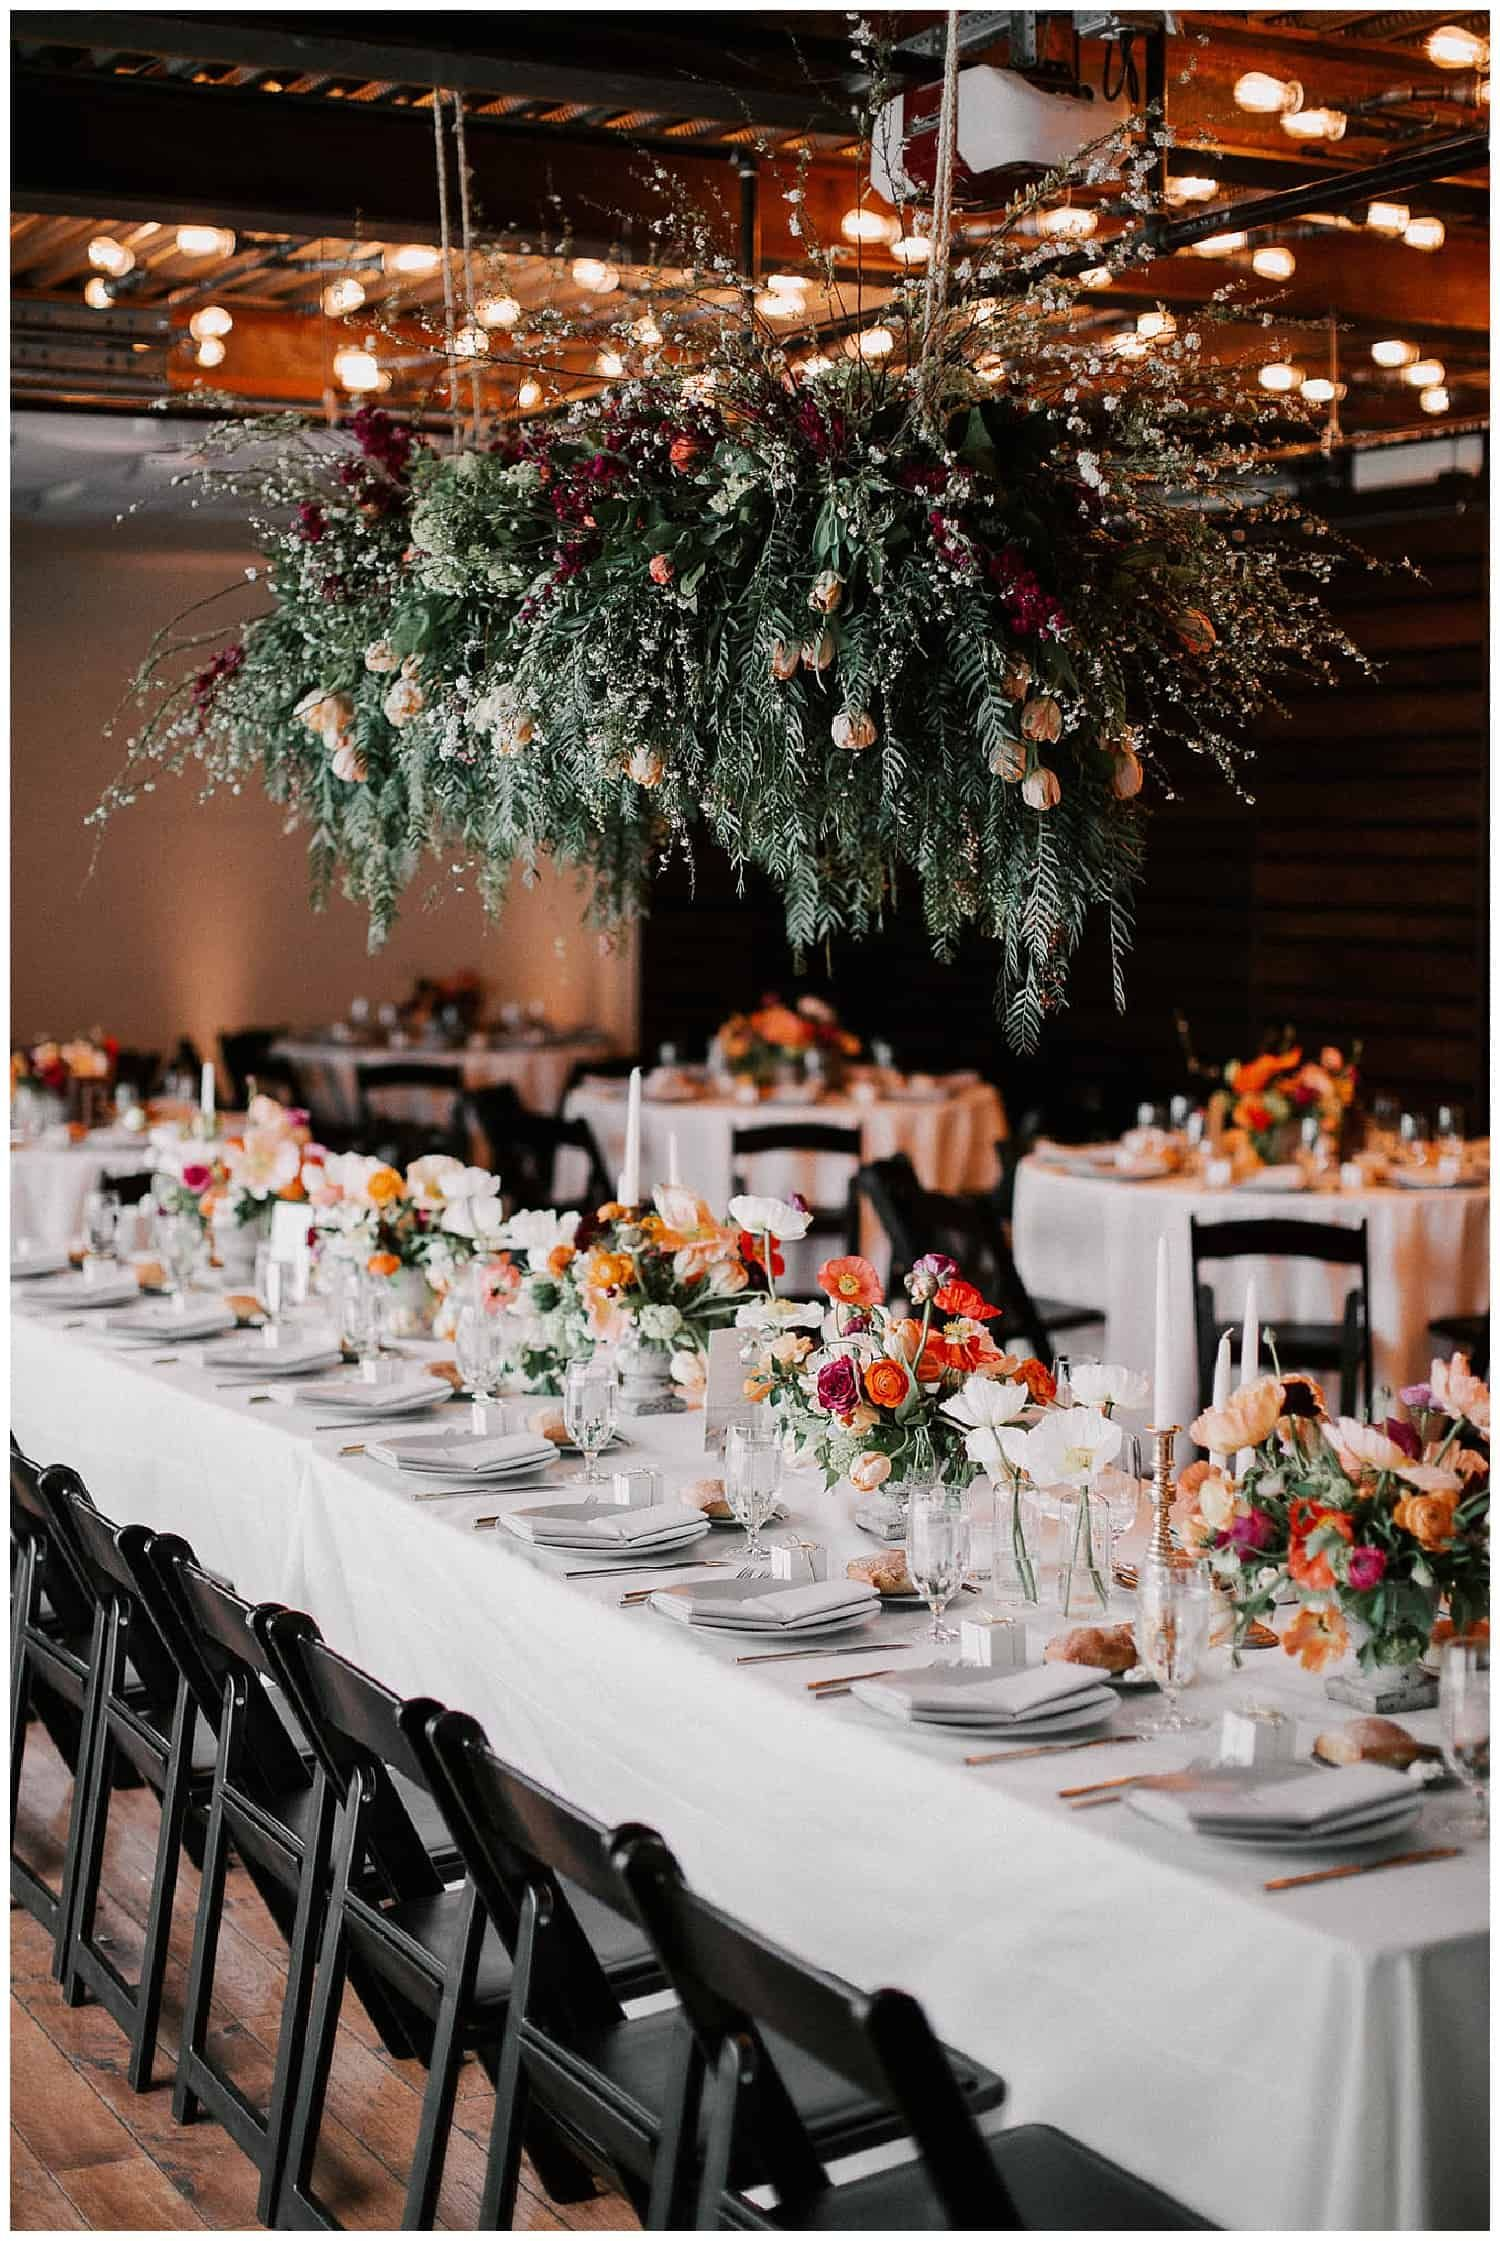 Fremont Foundry Wedding Venue in Seattle's Spring Rain